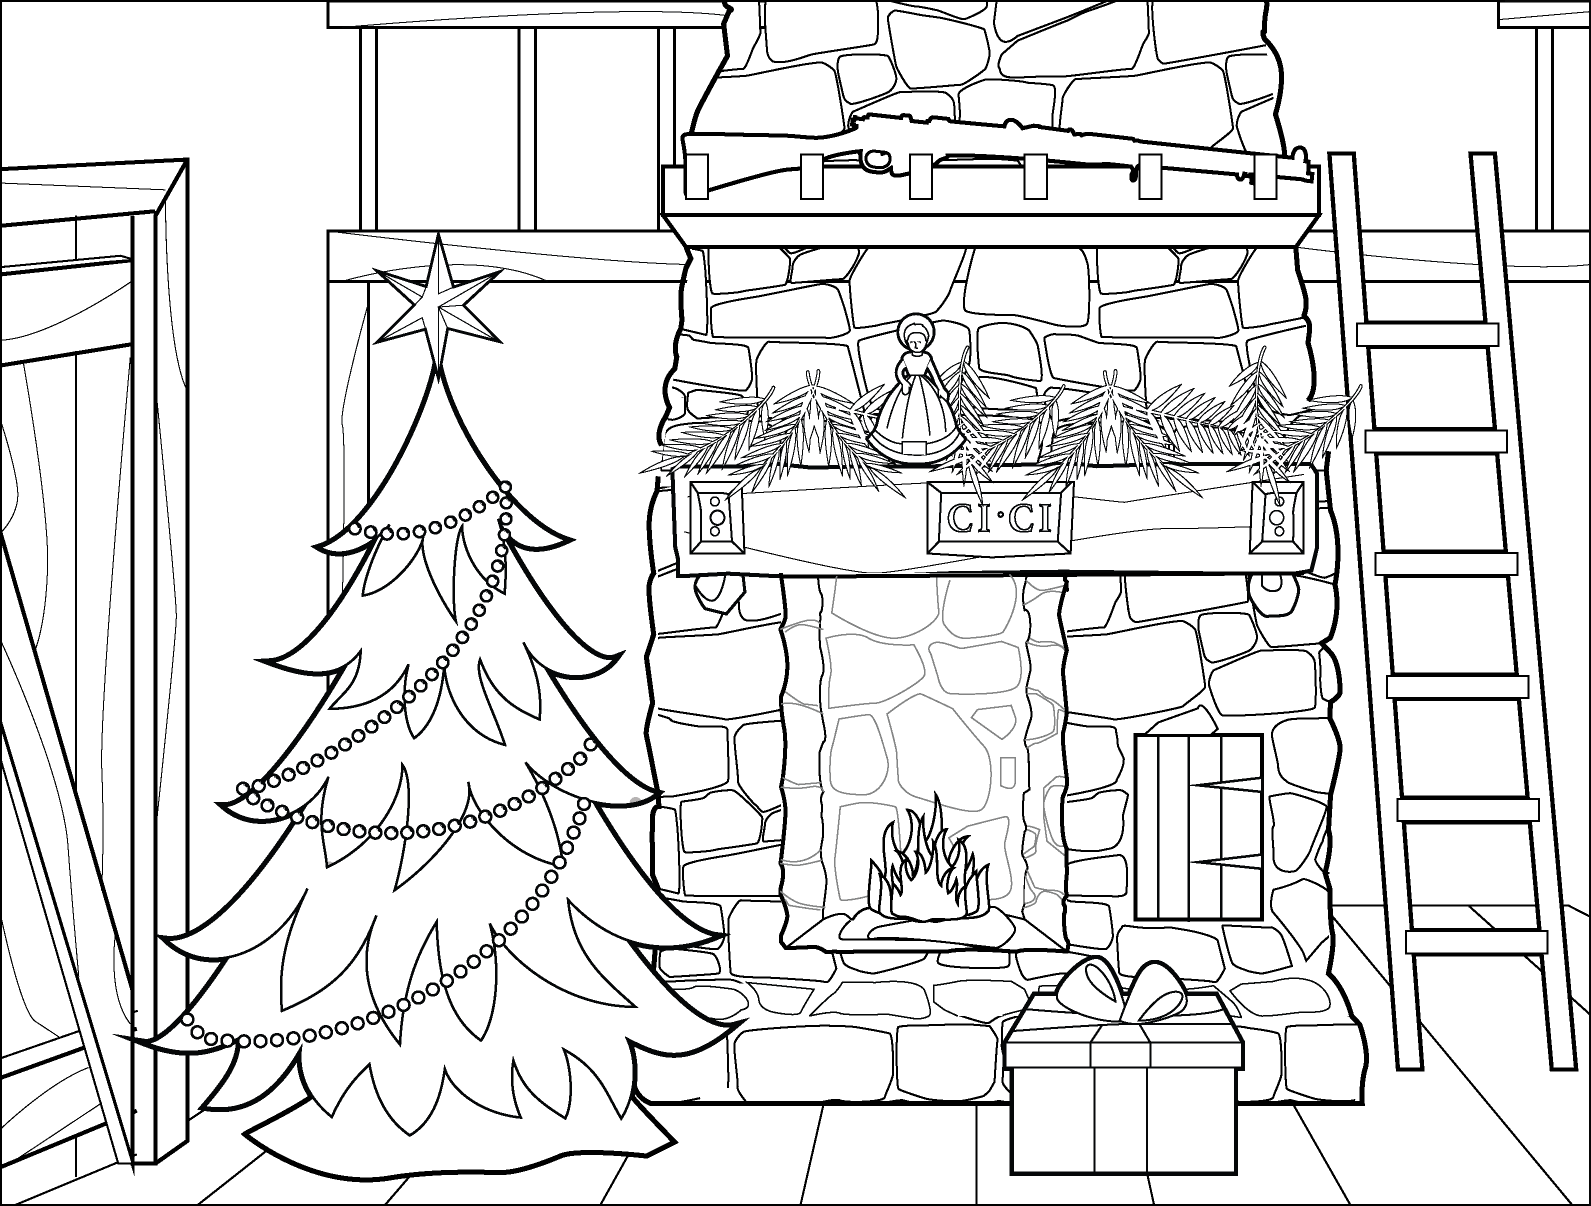 Little House On The Prairie Christmas Tree Coloring Page Christmas Tree Coloring Page Coloring Pages Christmas Coloring Pages